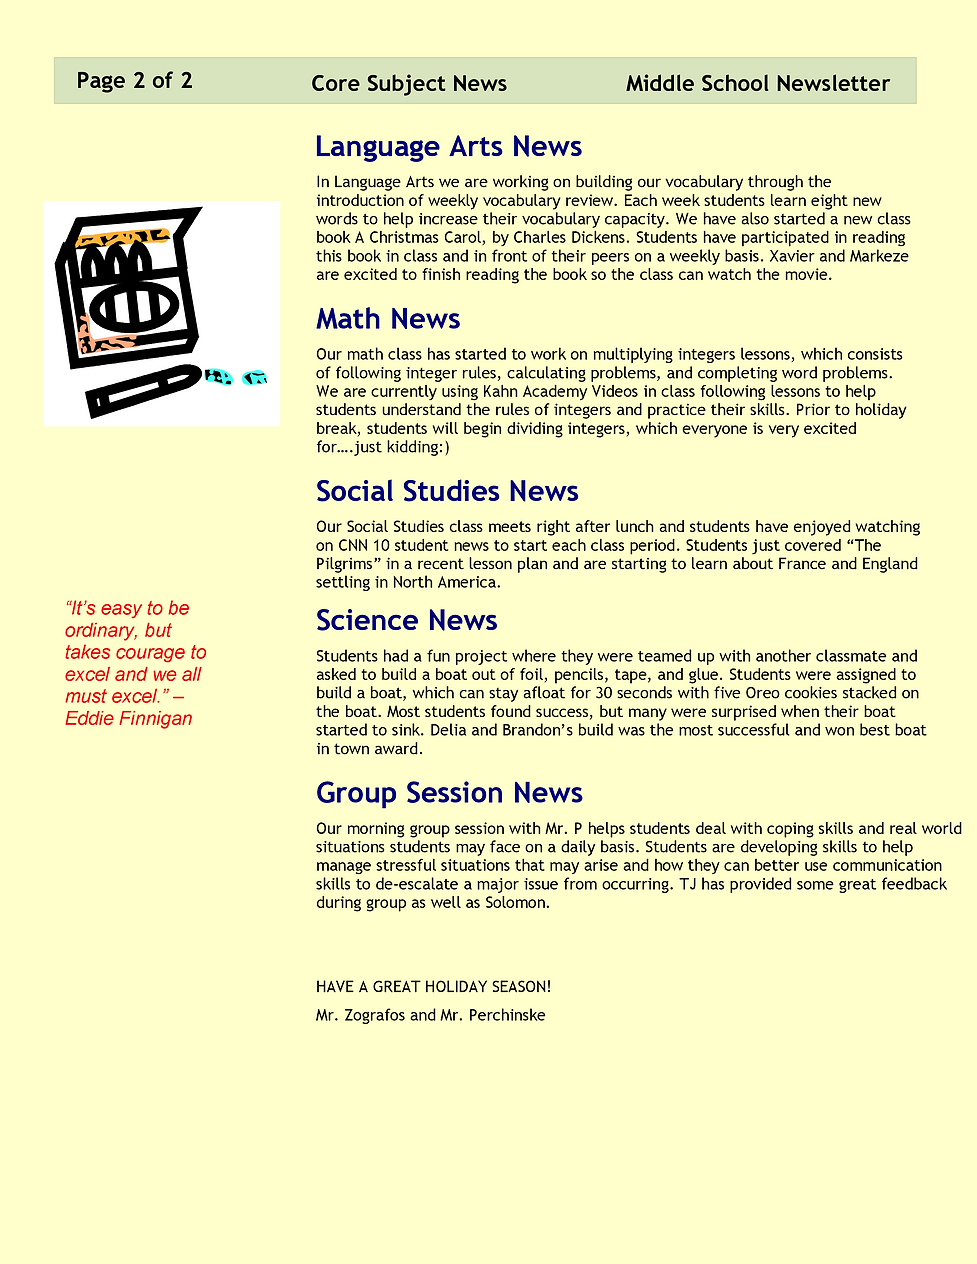 Classroom 2 Winter Newsletter-1.png